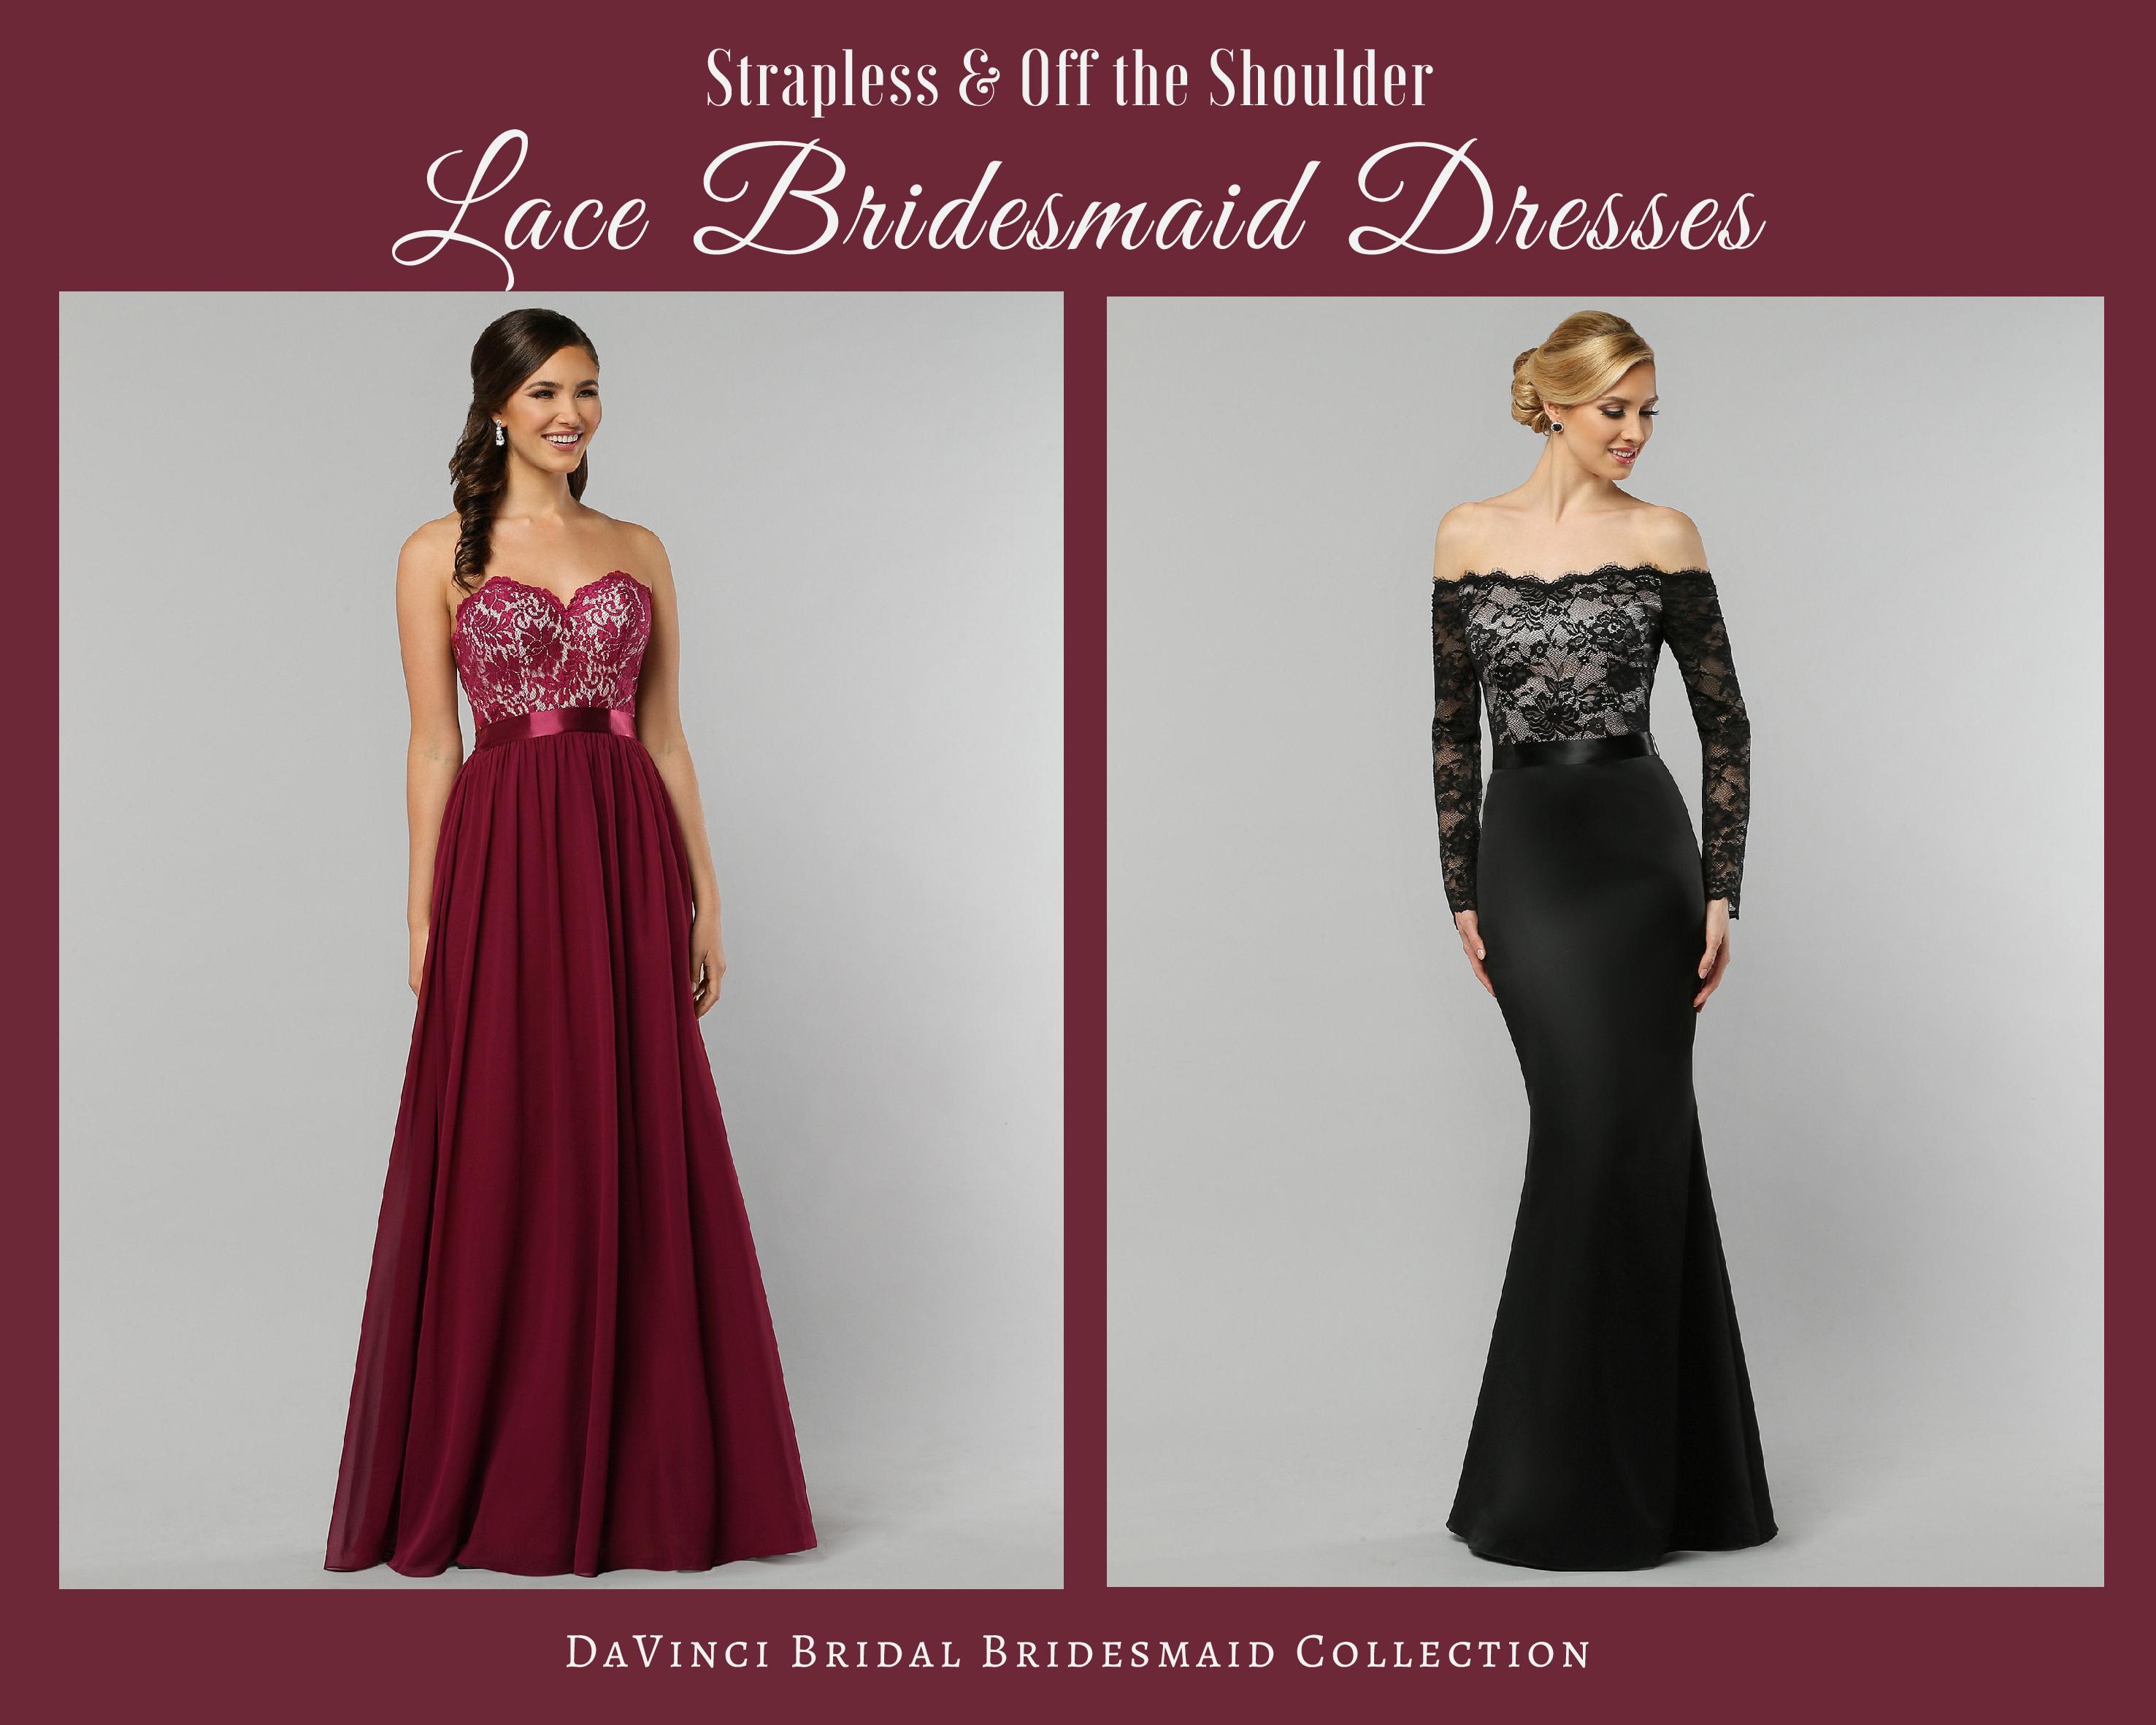 40a2fd5197a8 Long Strapless & Off-the-Shoulder Lace Bridesmaid Dresses – DaVinci Bridal  Fashion Blog